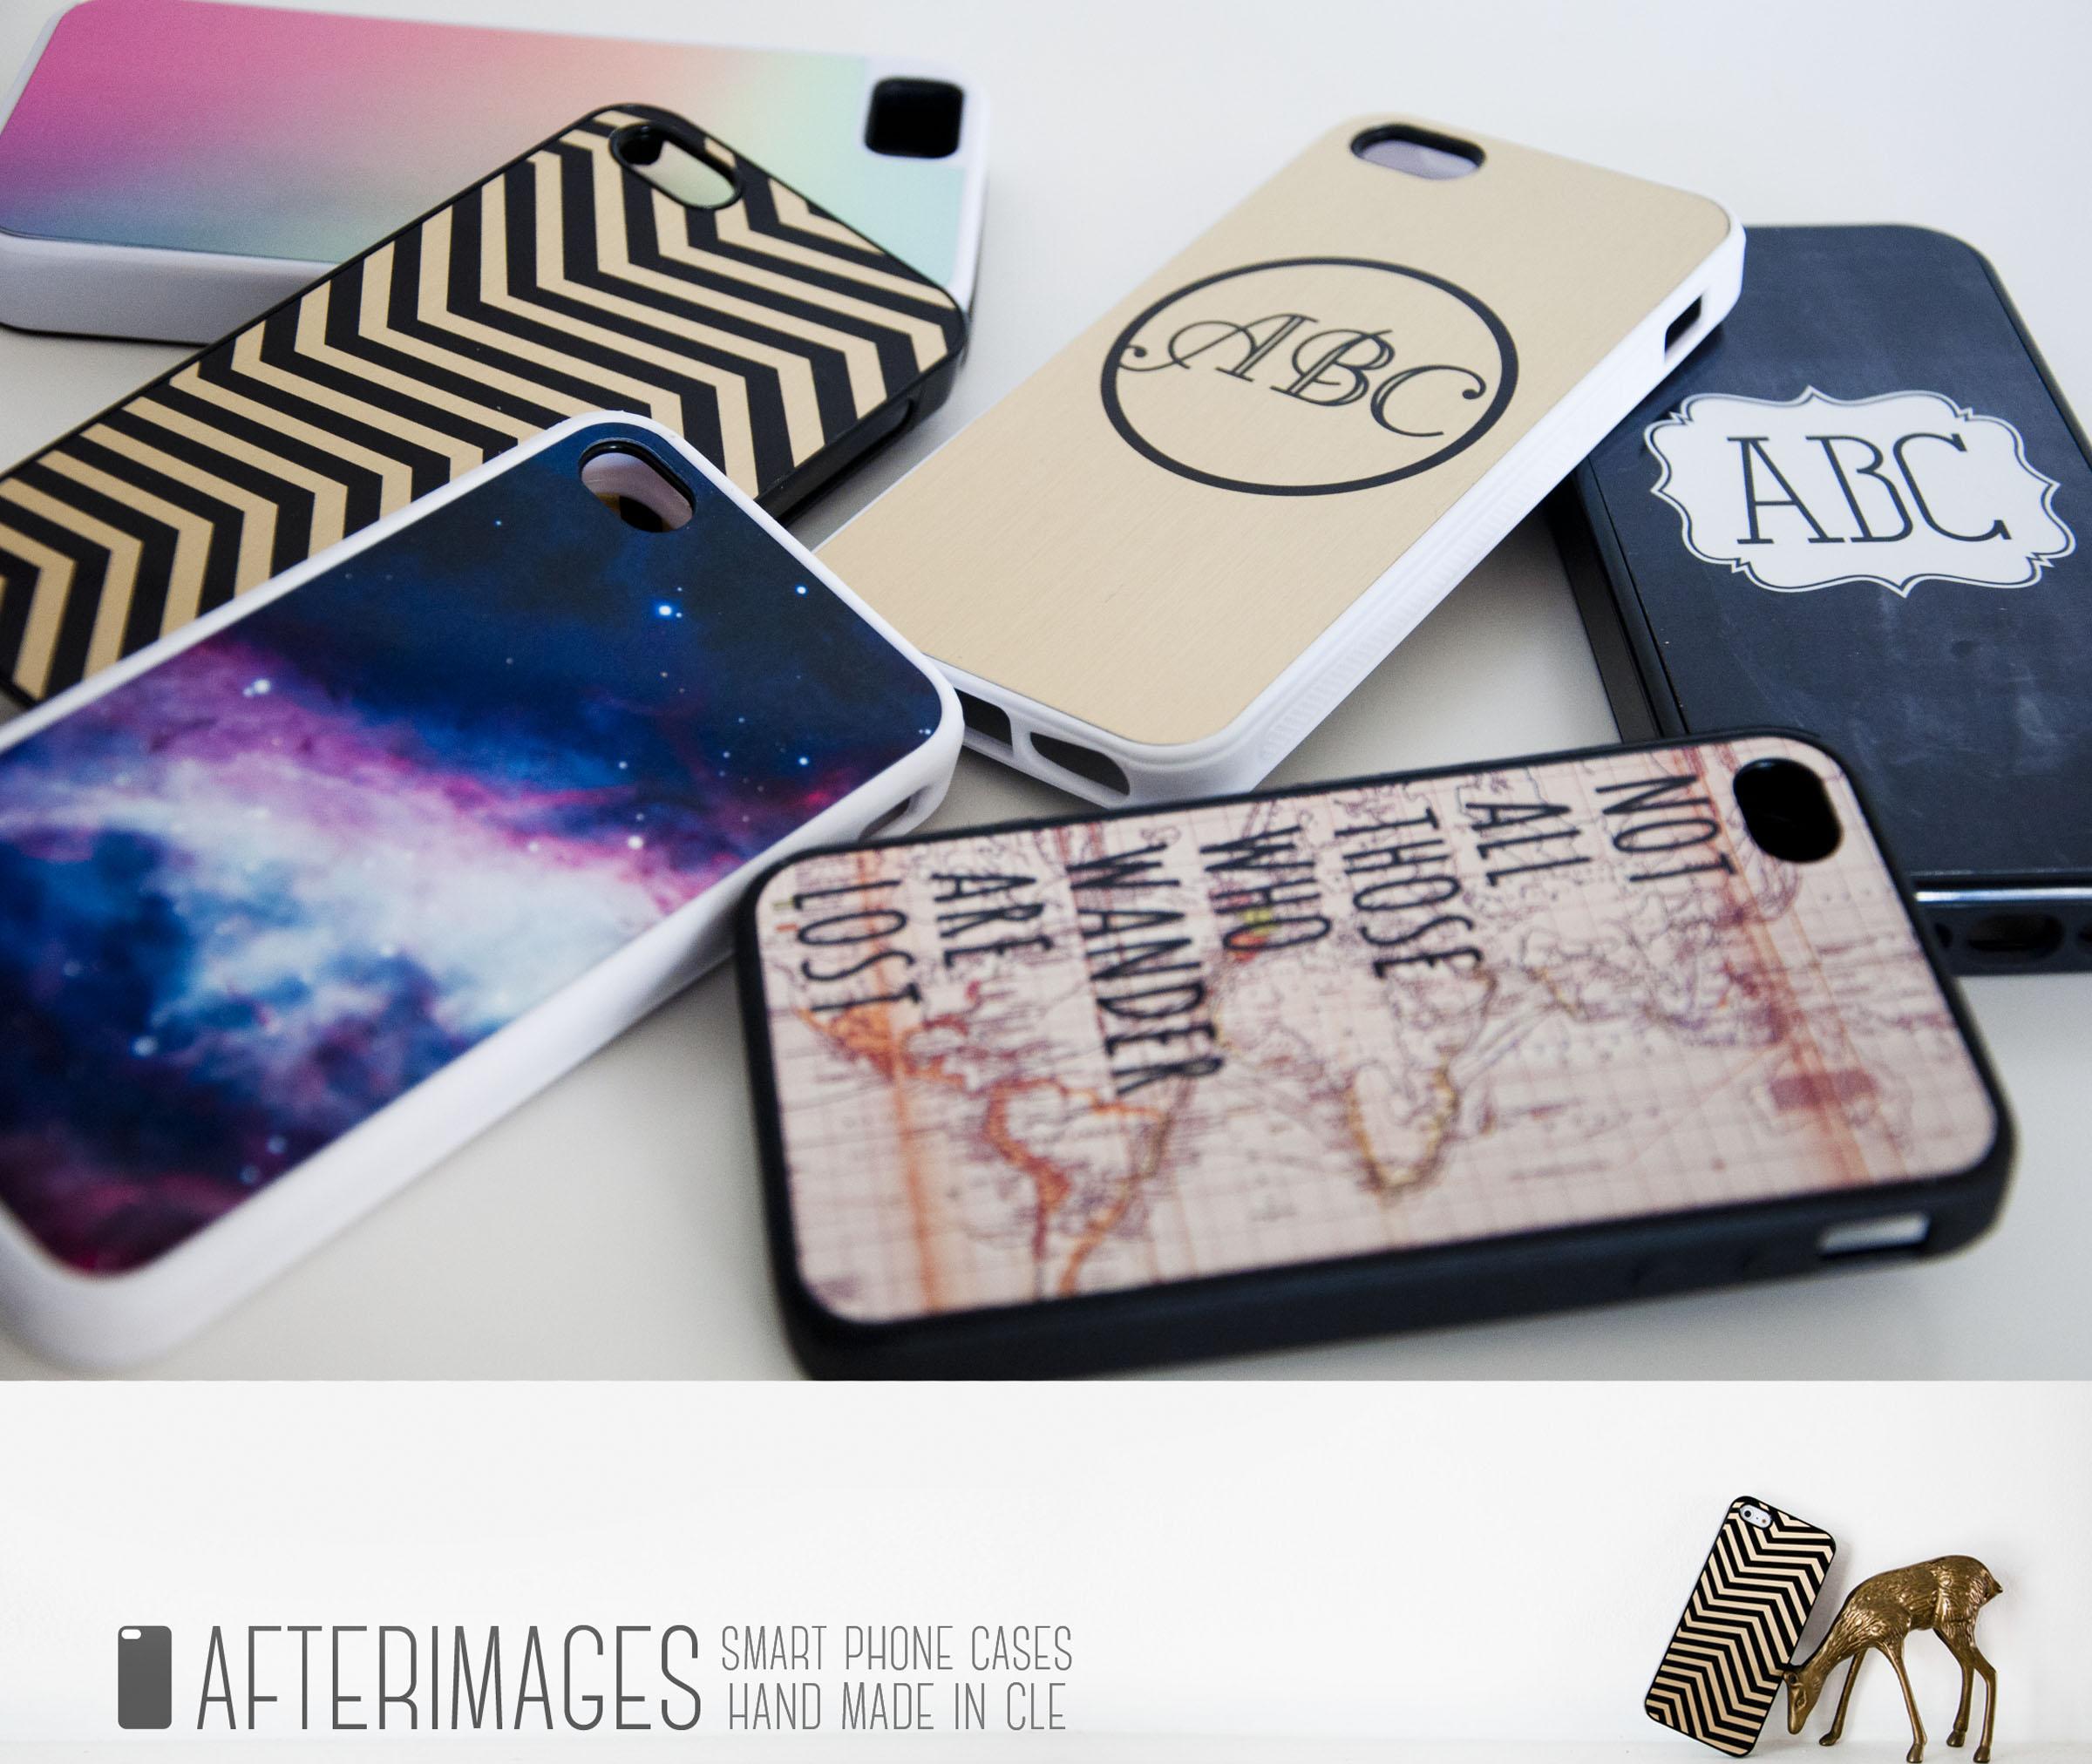 Pastel Iphone 5 Case Iphone 4 Case Iphone 4s Case Iphone